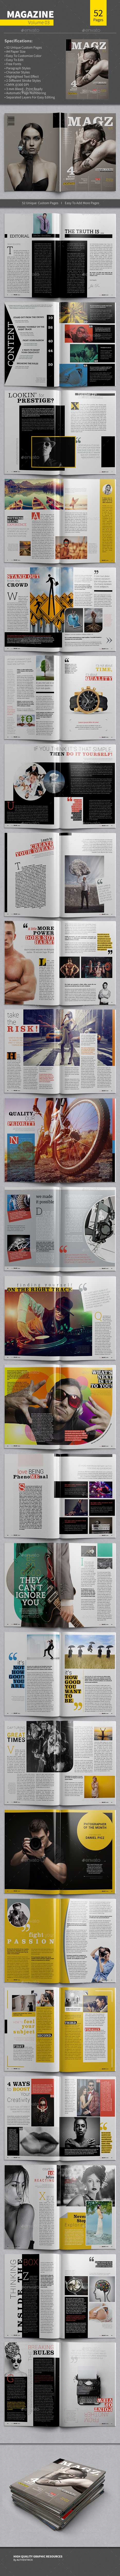 Magazine Template - Volume 03 - Magazines Print Templates